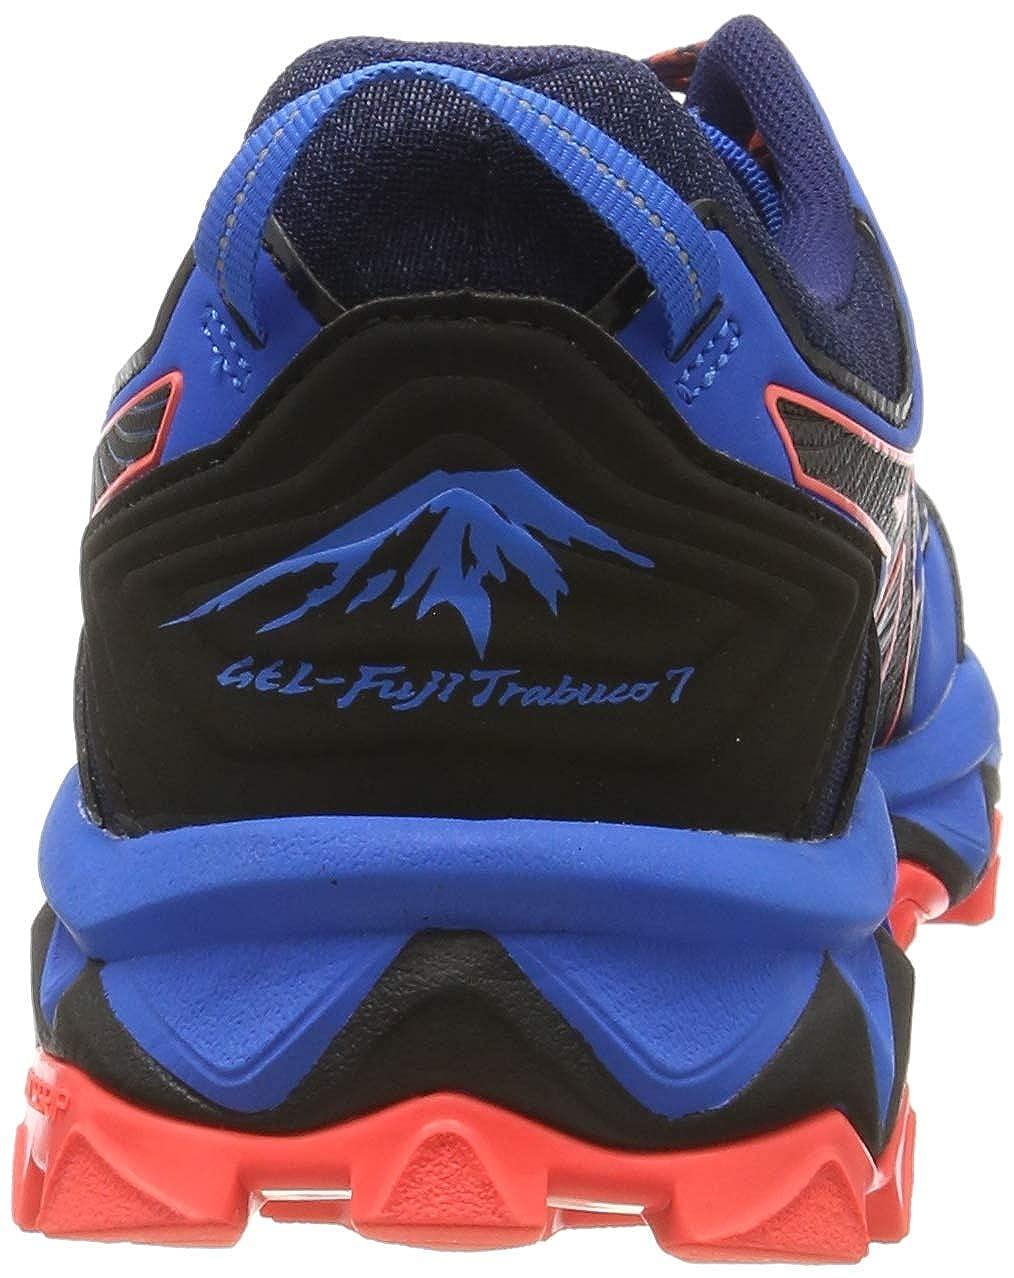 Schuhe ASICS Gel FujiTrabuco 7 1011A197 Stone GreyBlack 020